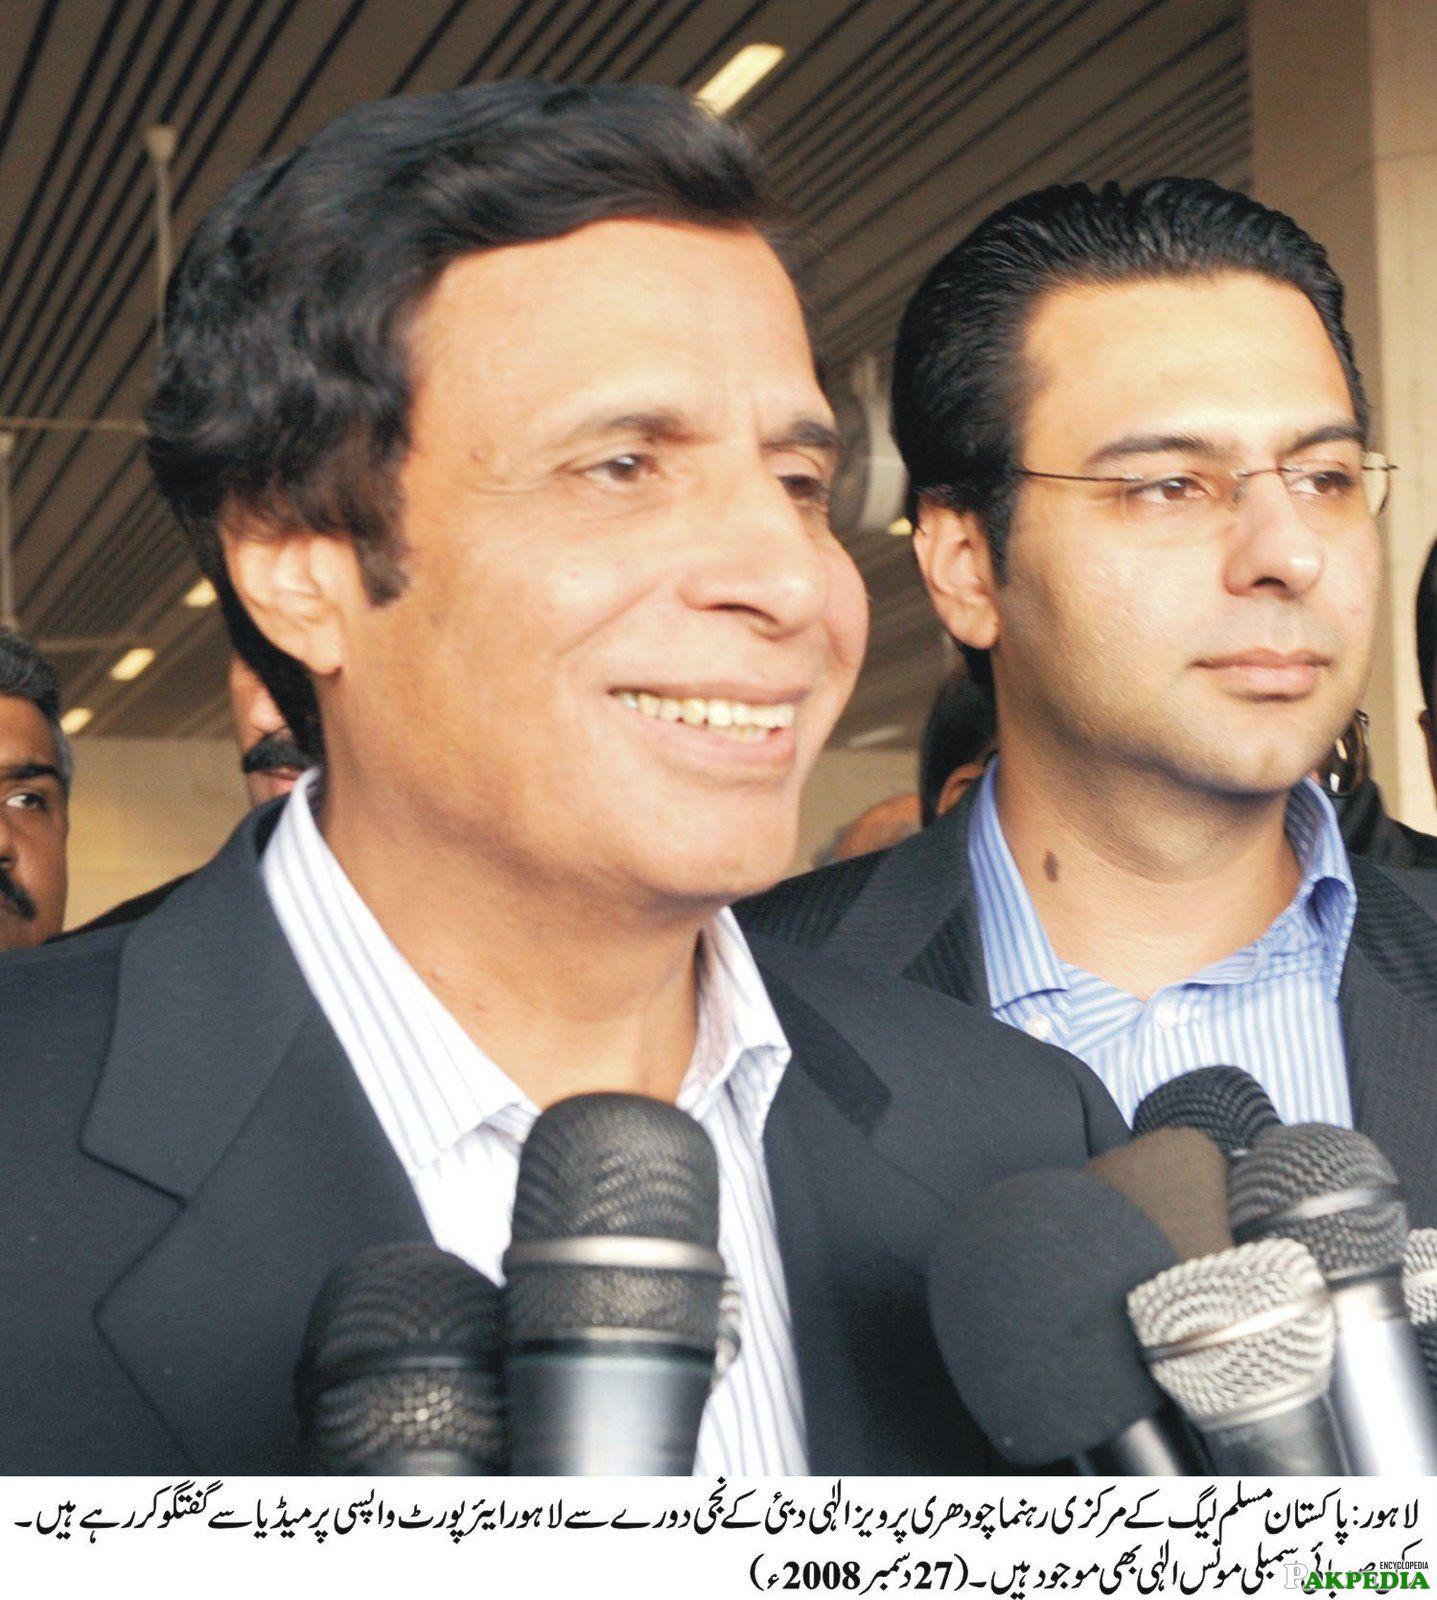 Chaudhry Pervaiz Elahi an old photo